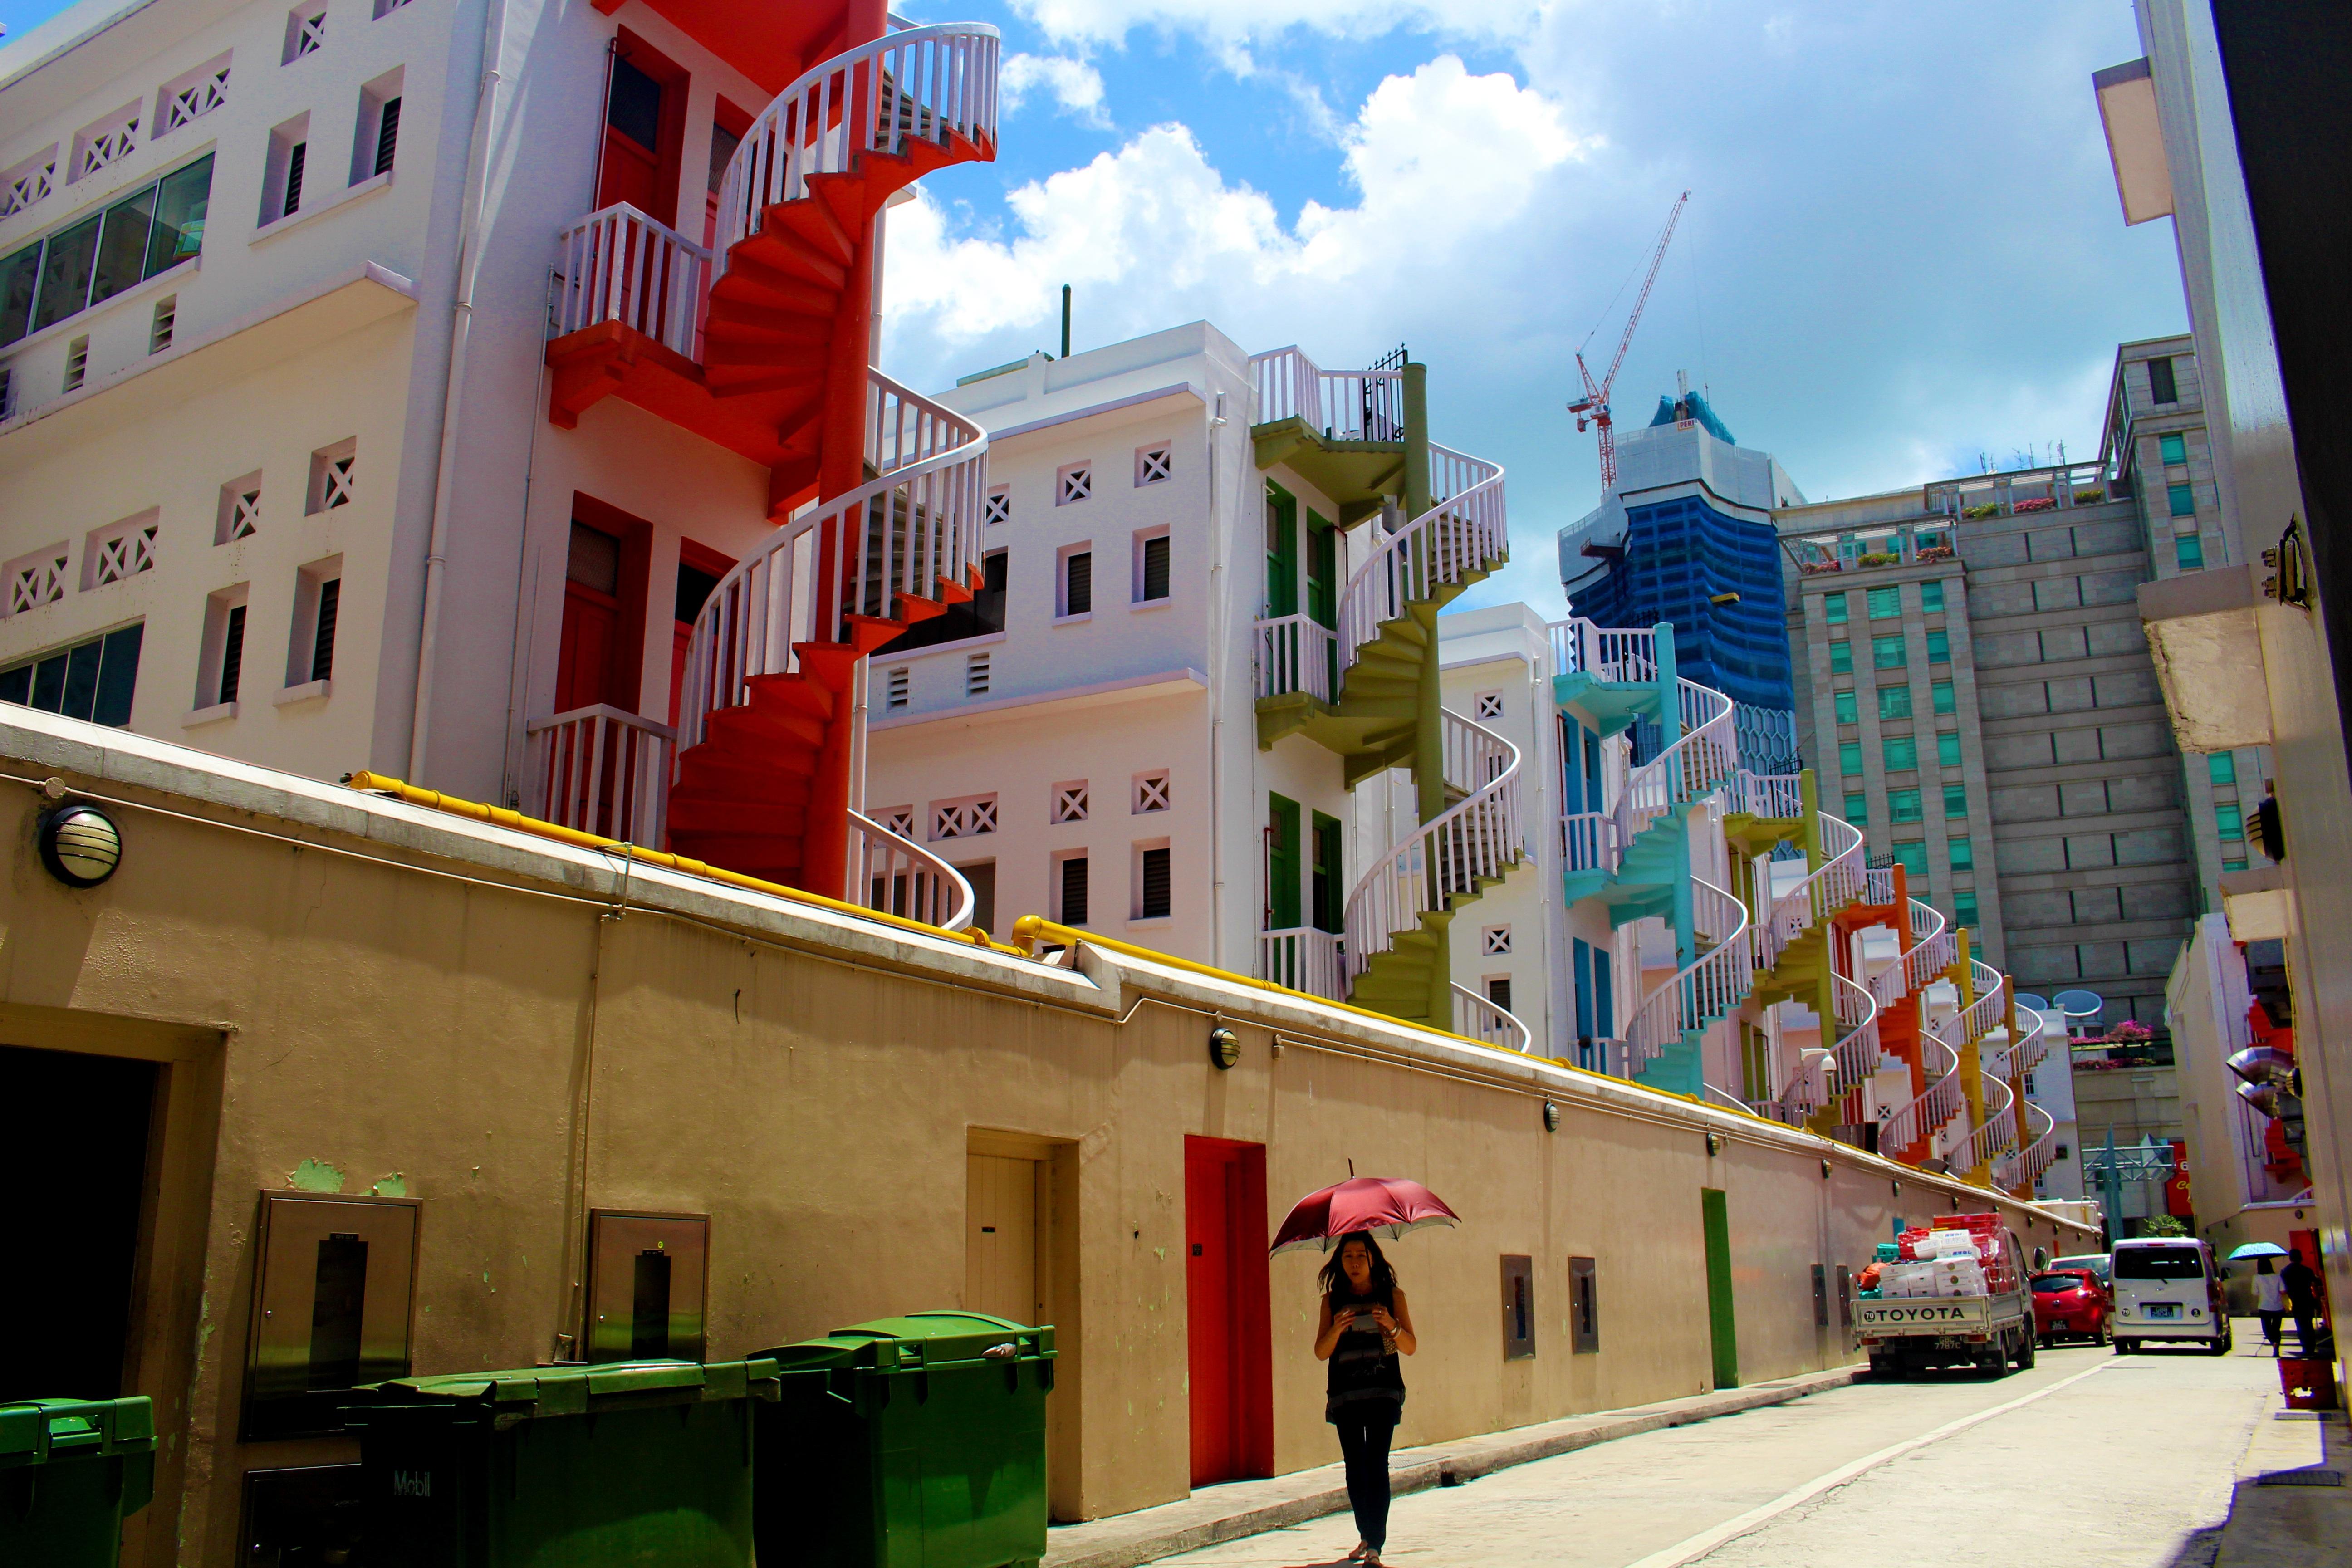 Fotos gratis arquitectura mujer la carretera calle pueblo edificio casa paisaje urbano - Casa asia empleo ...